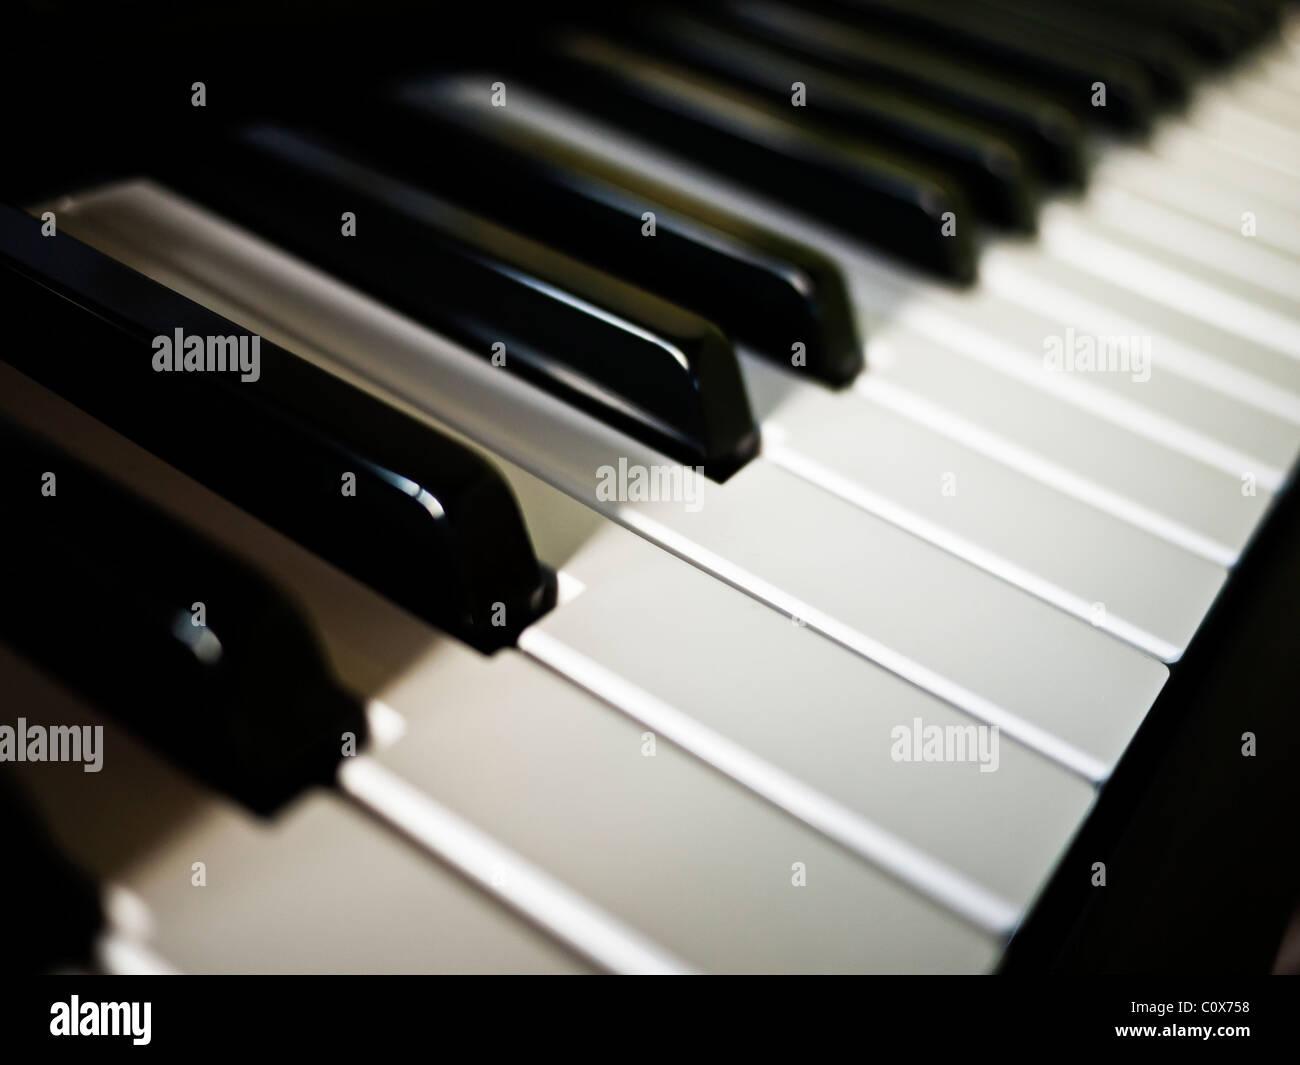 Electric piano keyboard - Stock Image